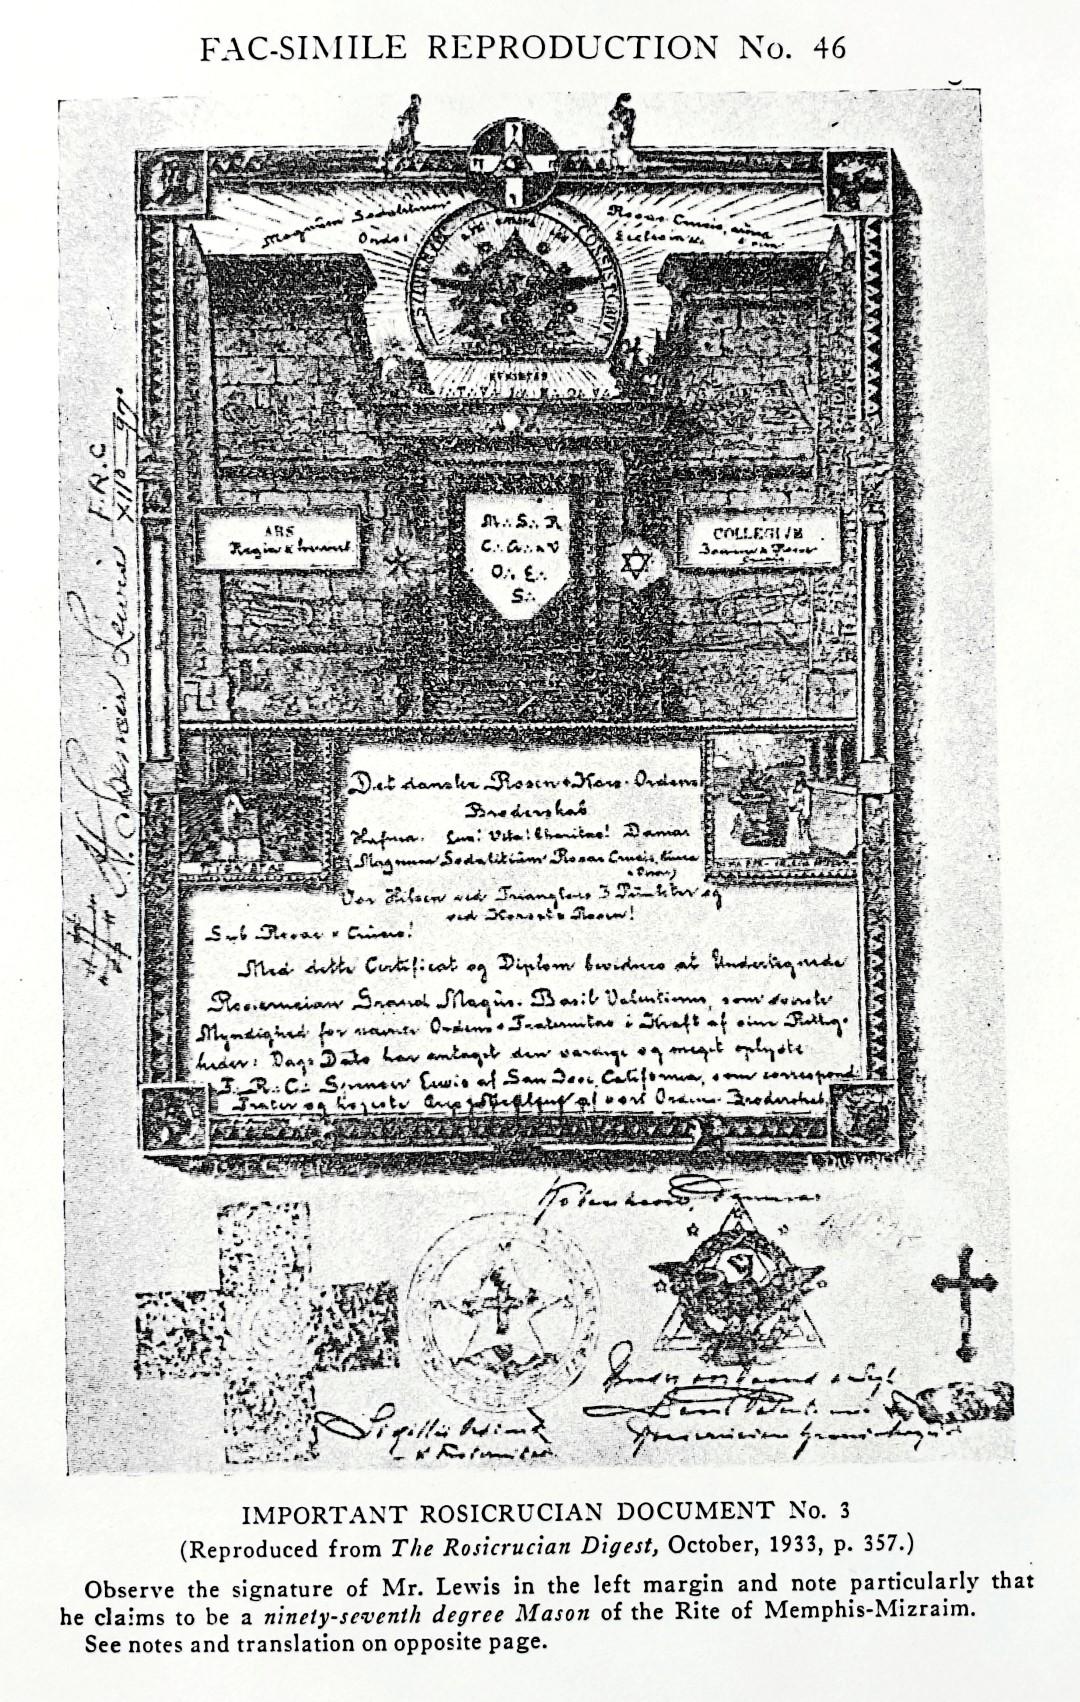 Reuben Swinburne Clymer, The Rosicrucian Fraternity in America, Book of Rosicruciae, Spencer Lewis, A.M.O.R.C., Memphis Mizraim